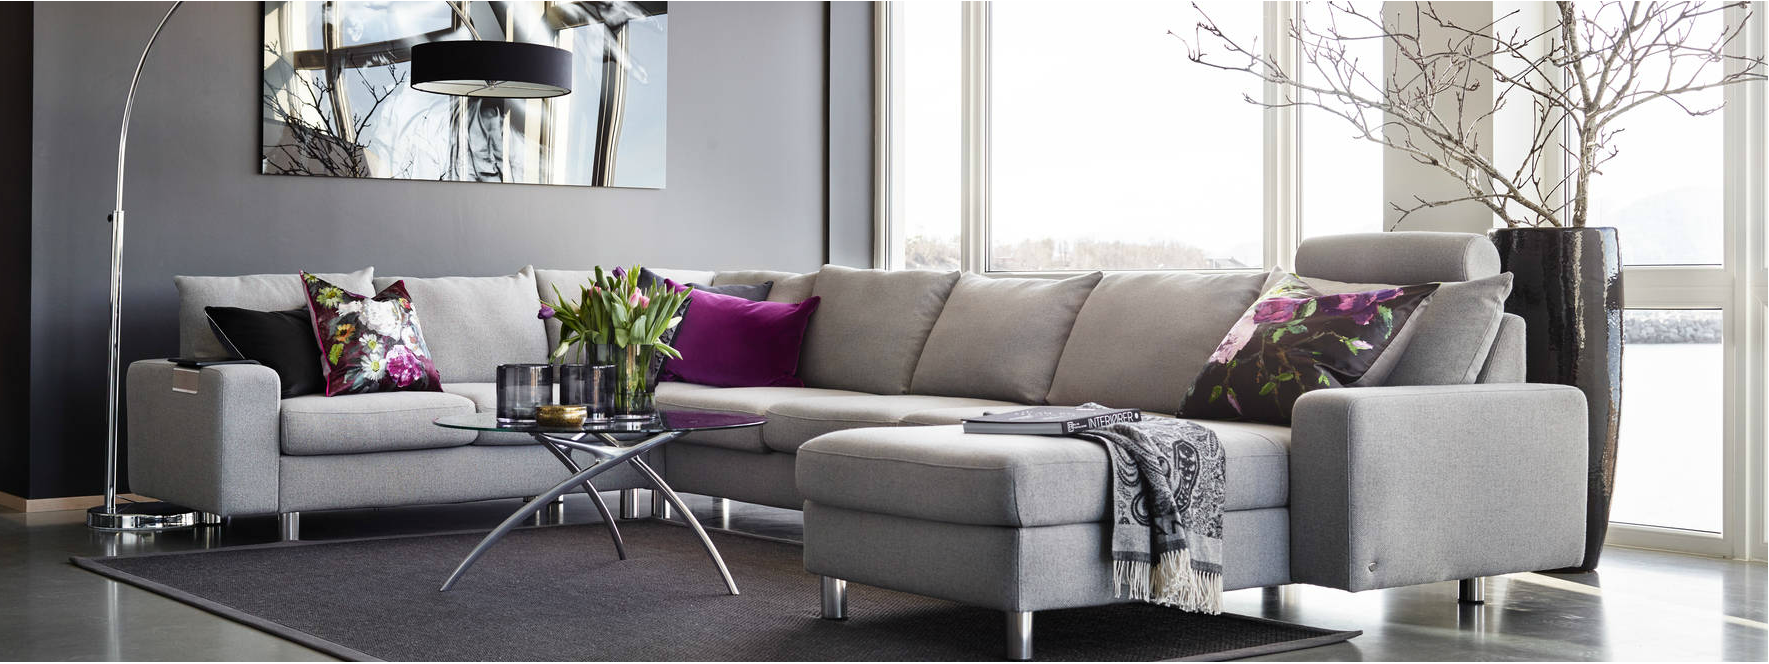 salons et canap s stressless. Black Bedroom Furniture Sets. Home Design Ideas